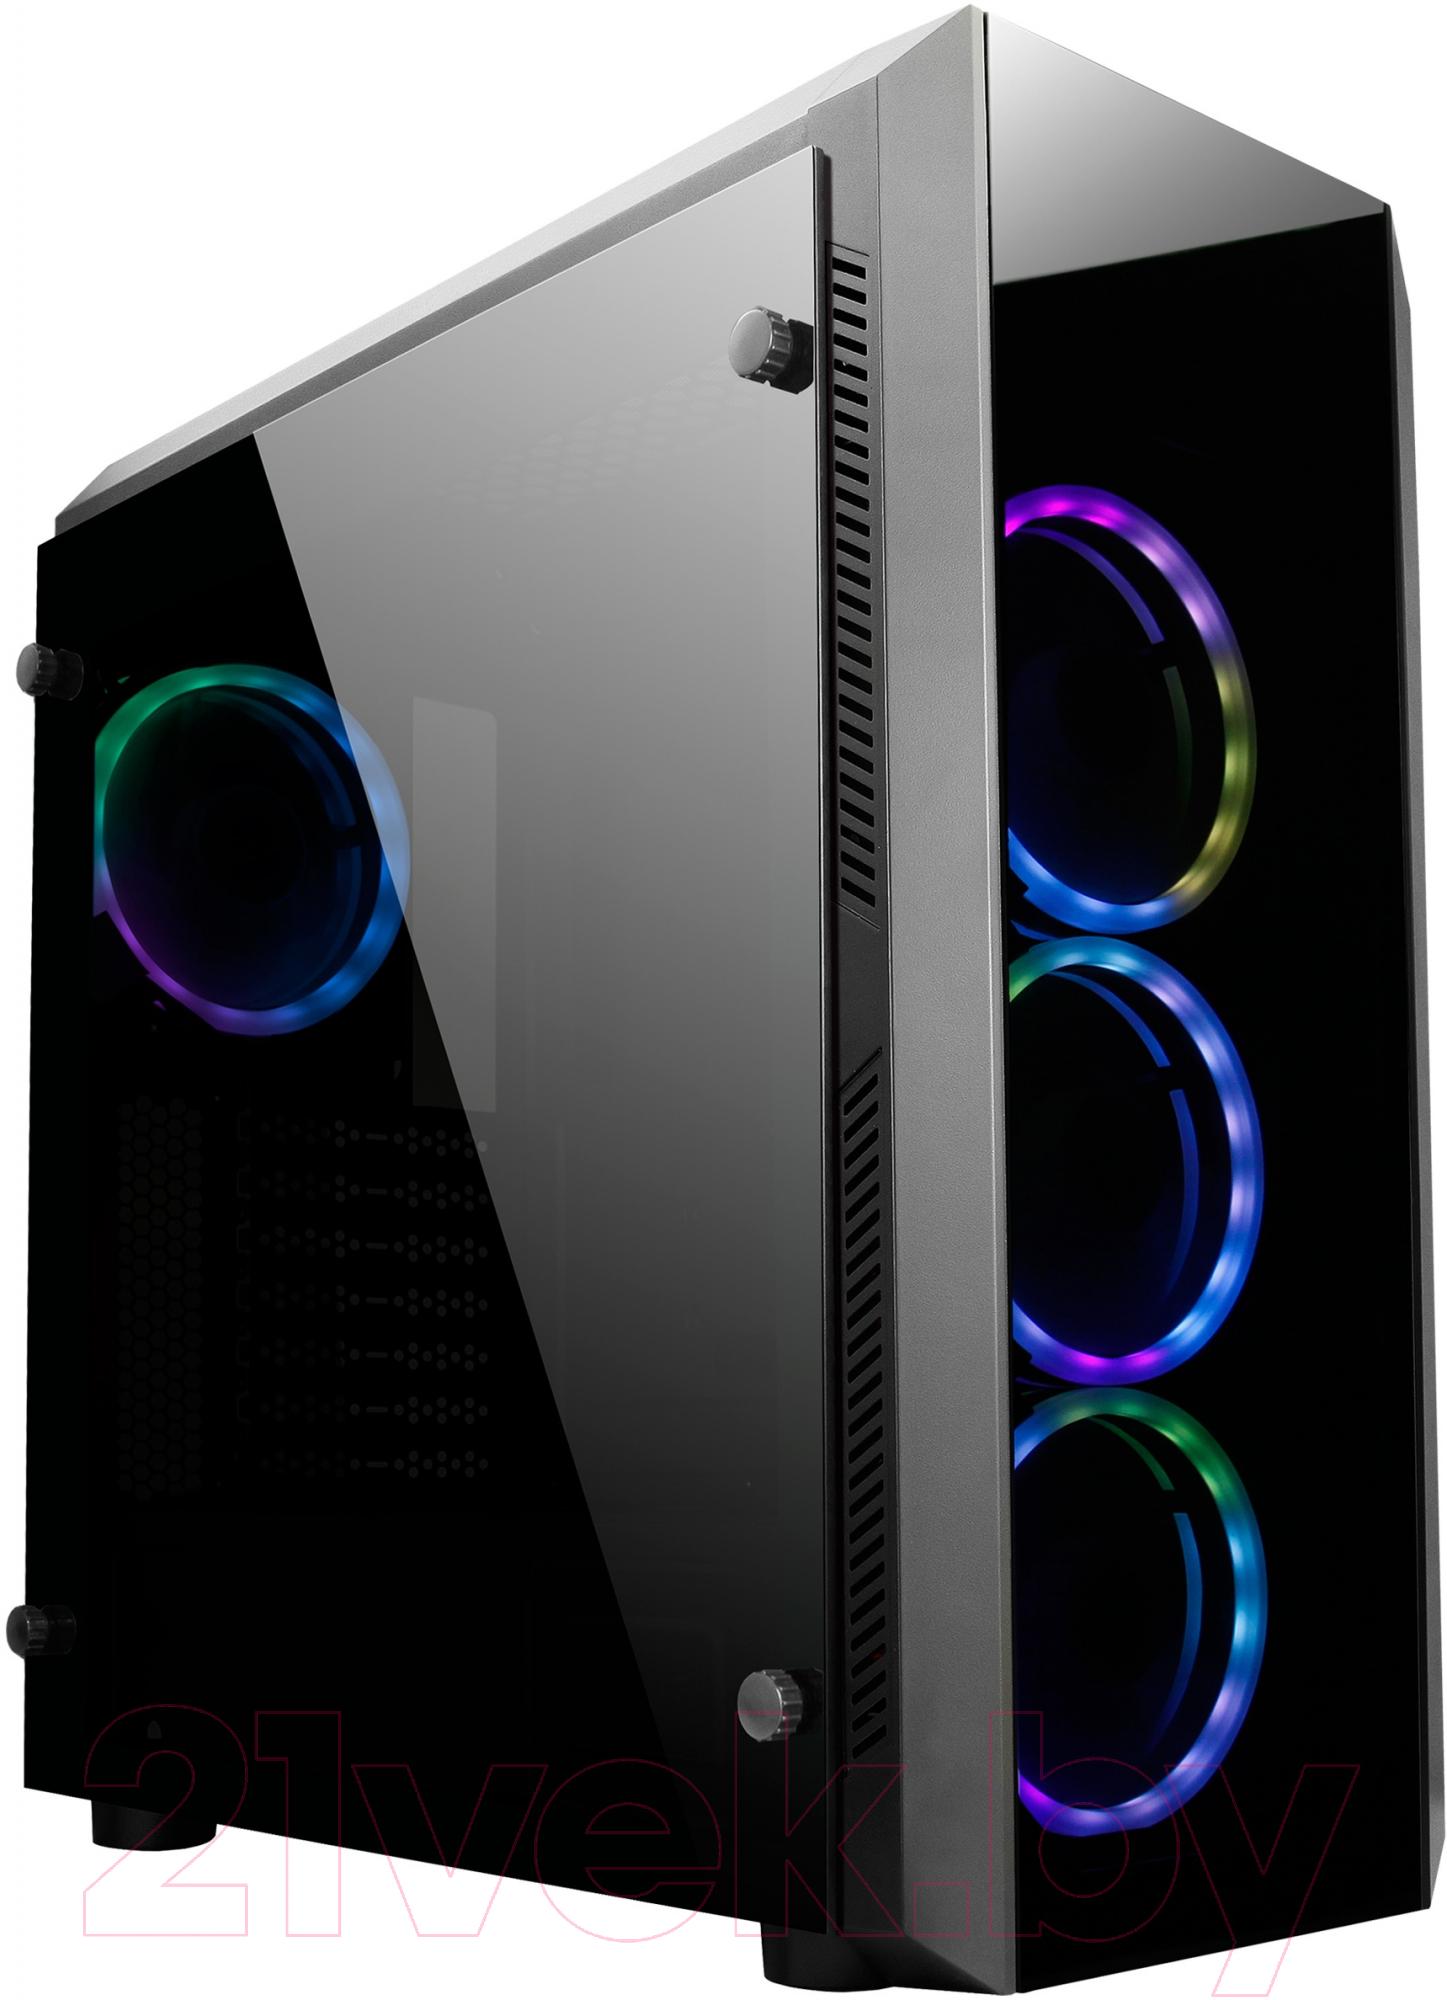 Купить Системный блок Jet, Gamer Grand 9i9900KD32HD2SD24X208TC2H7, Беларусь